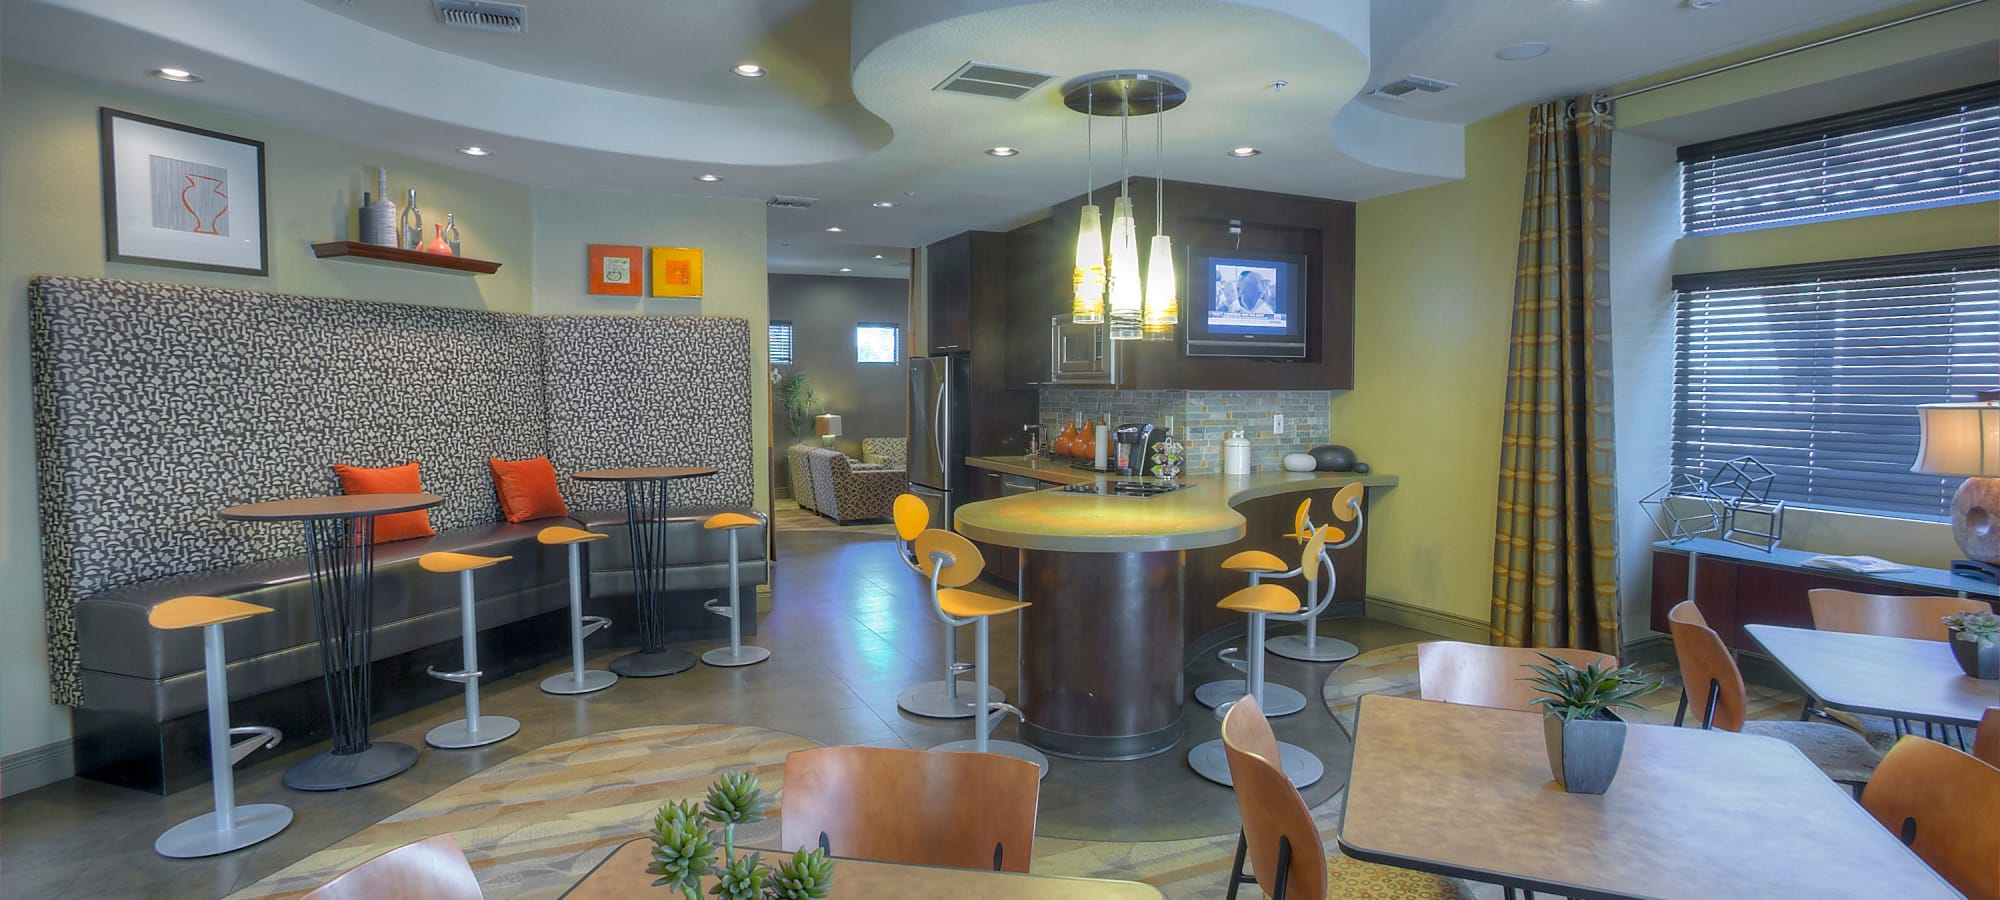 Community lounge at The Regents at Scottsdale in Scottsdale, Arizona